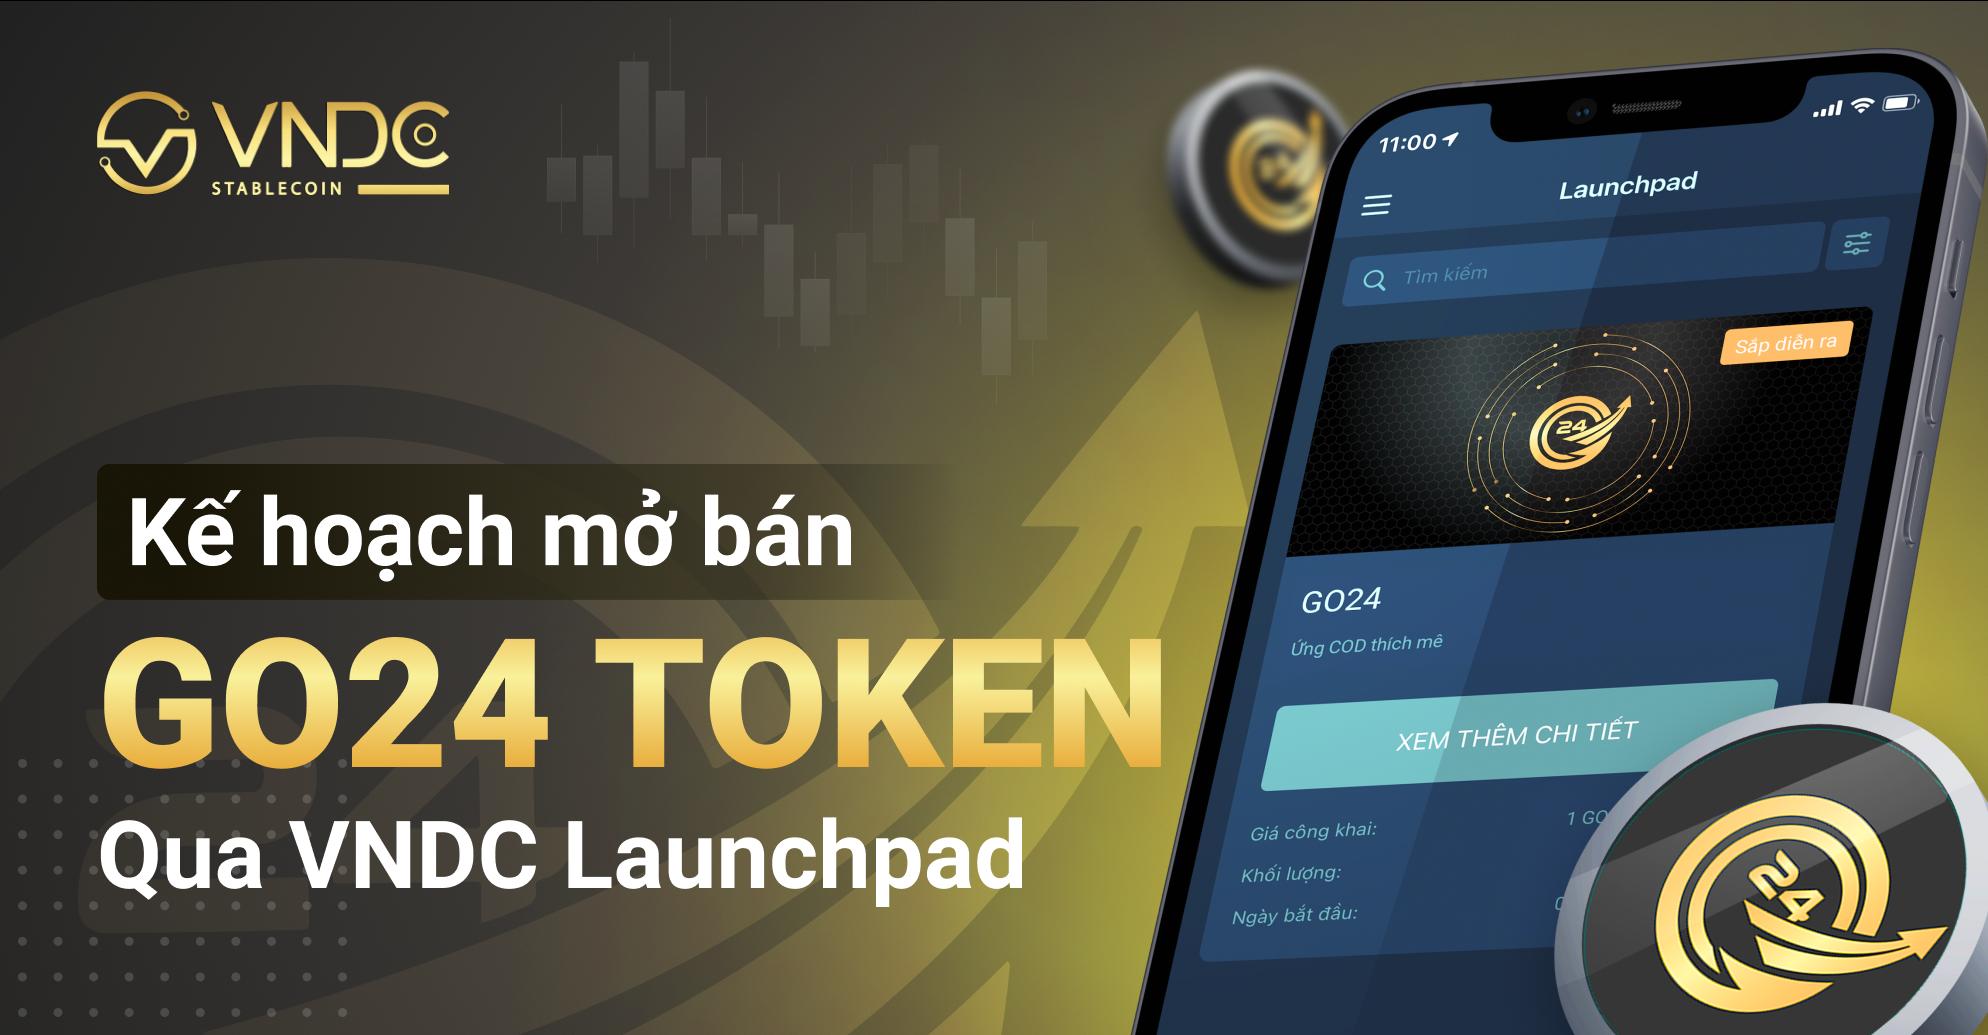 Kế hoạch mở bán GO24 token (GO24) qua VNDC Launchpad